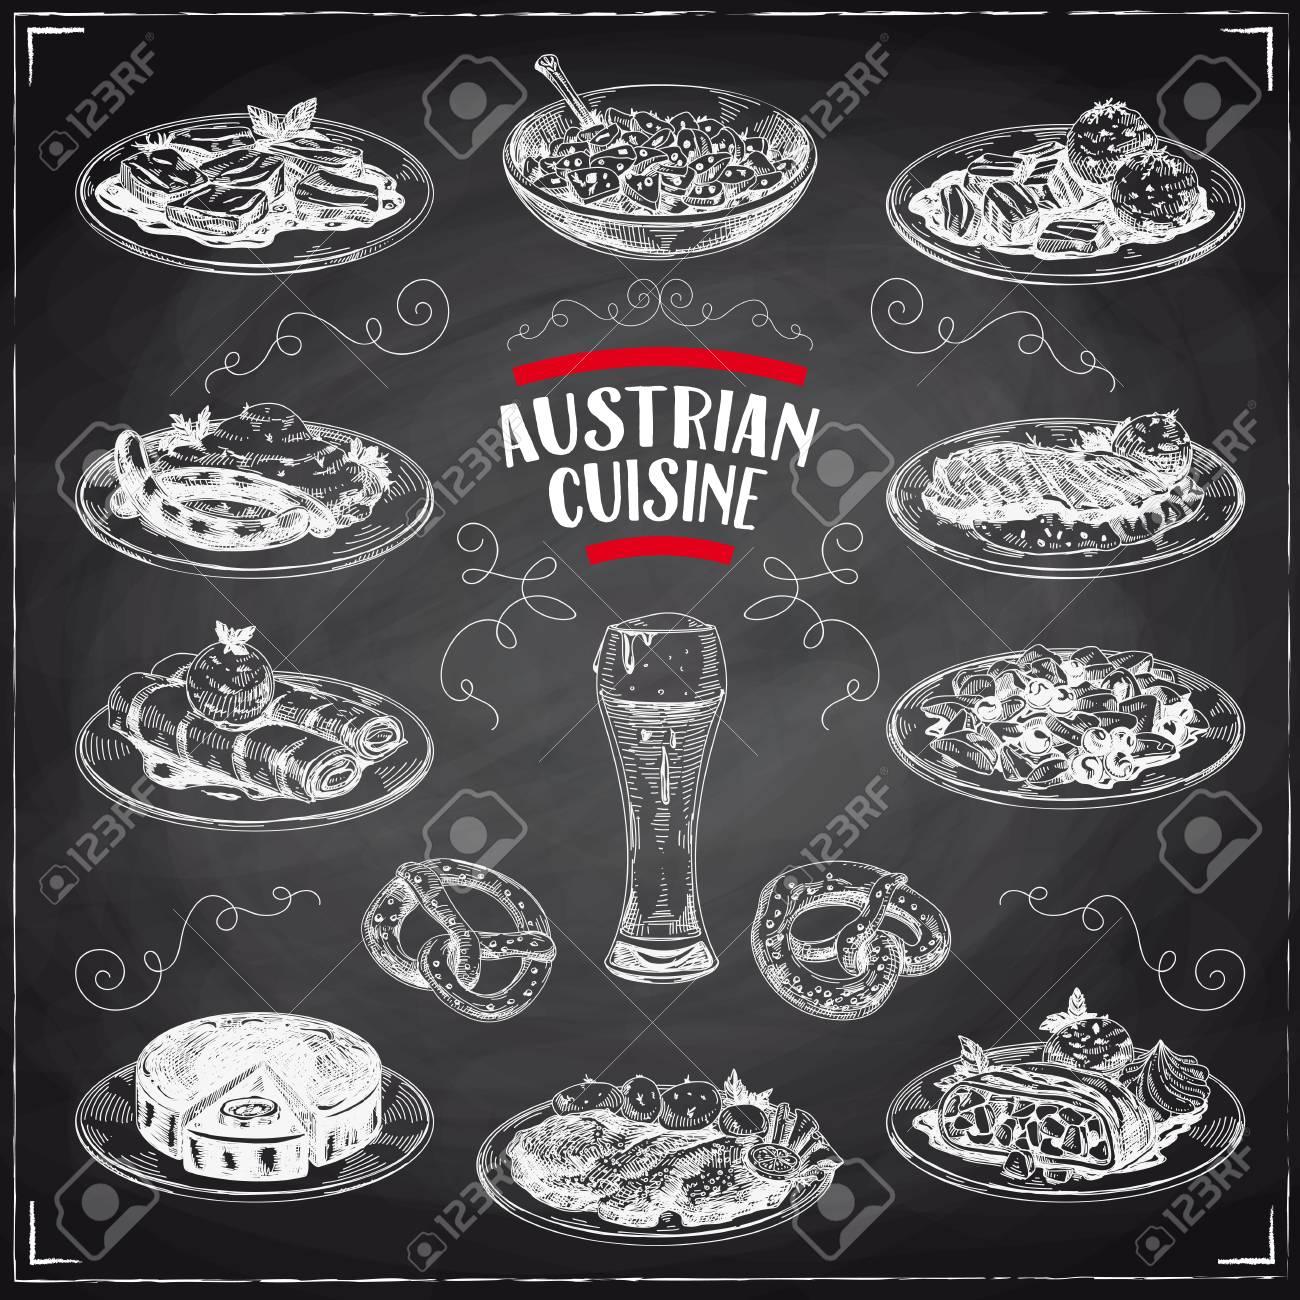 Beautiful Vector Hand Drawn Austrian Cuisine Illustrations Set